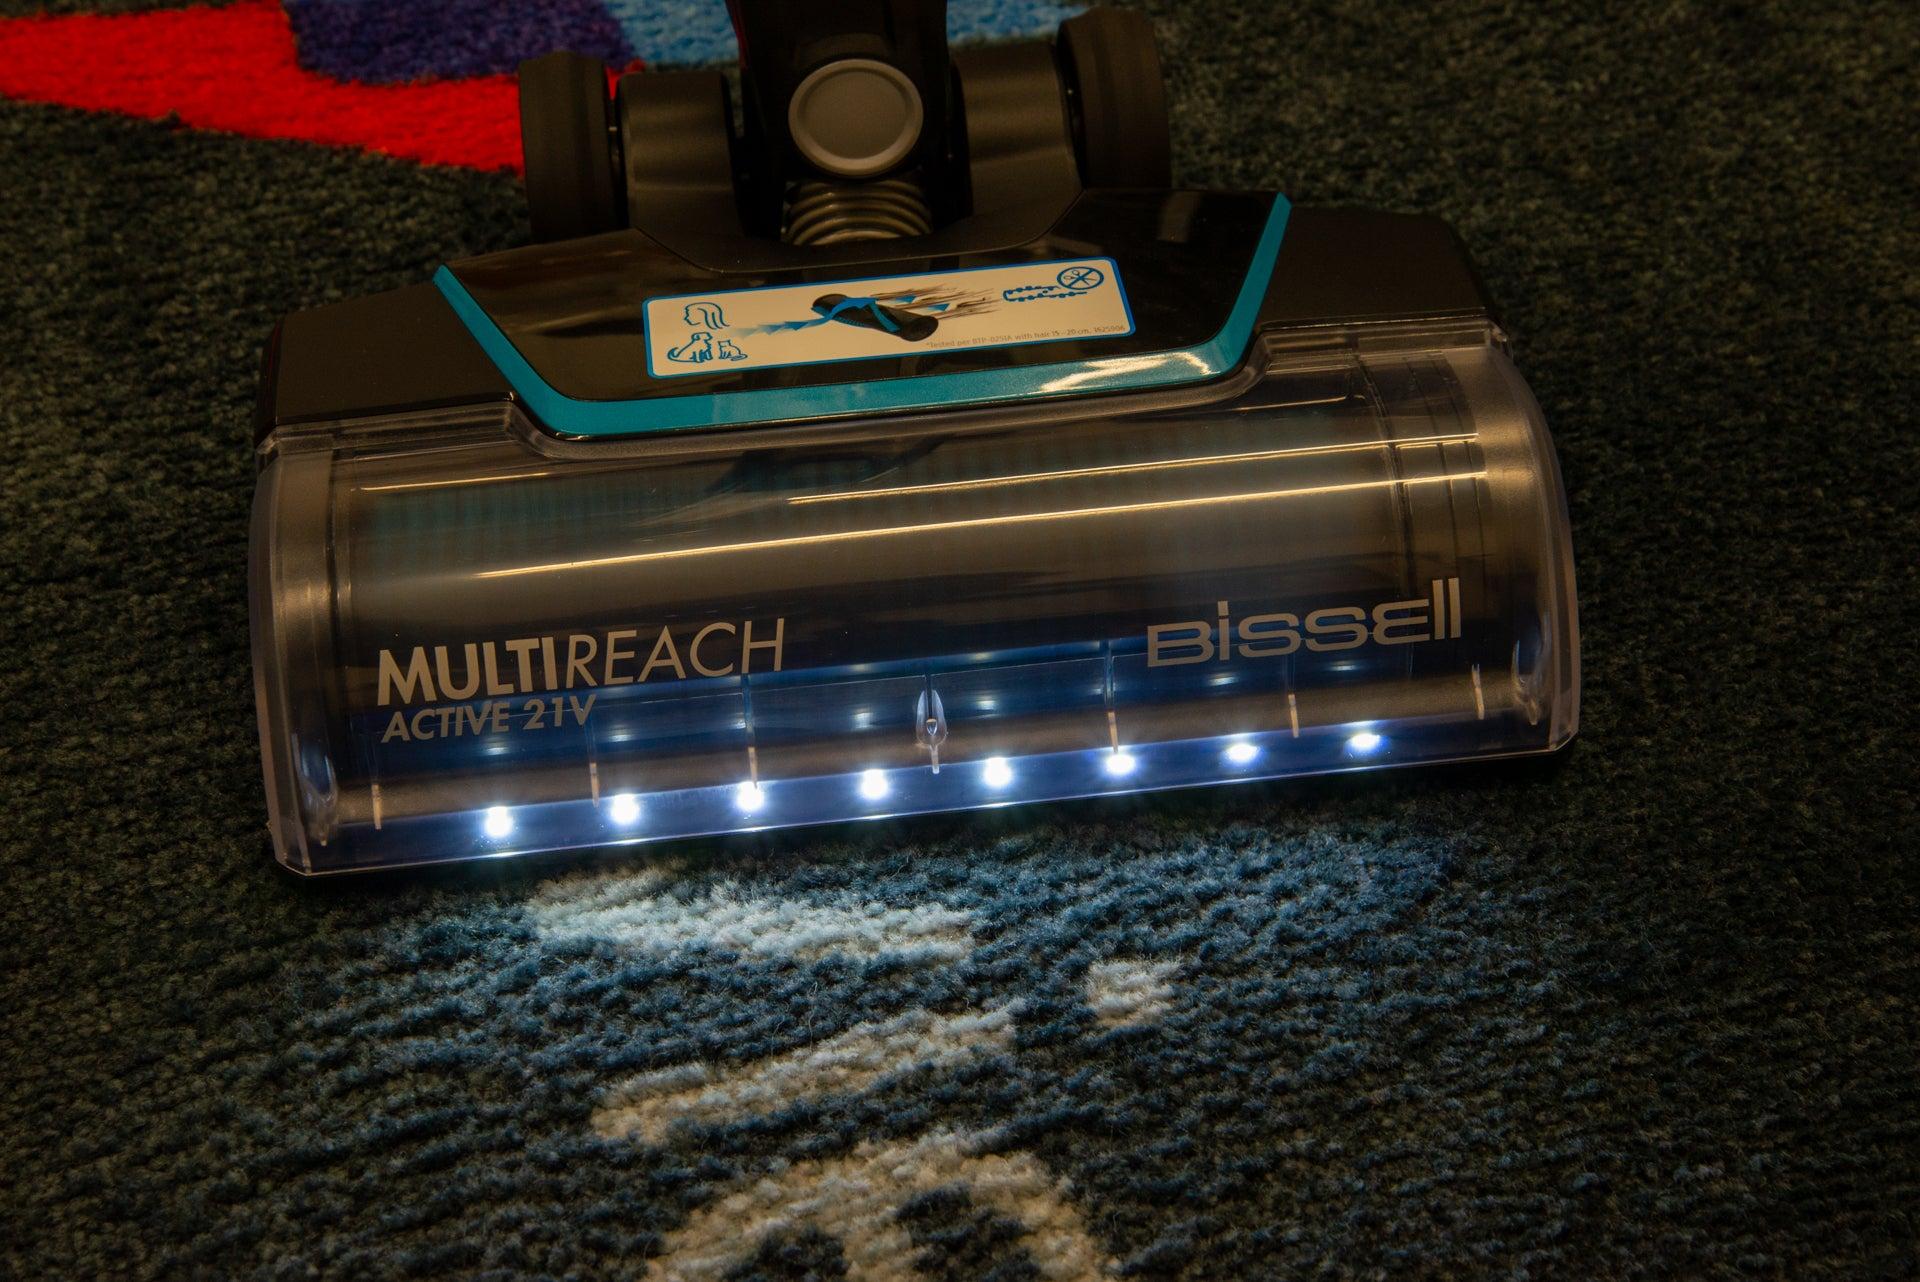 Bissell Multi Reach Active 21V headlightss